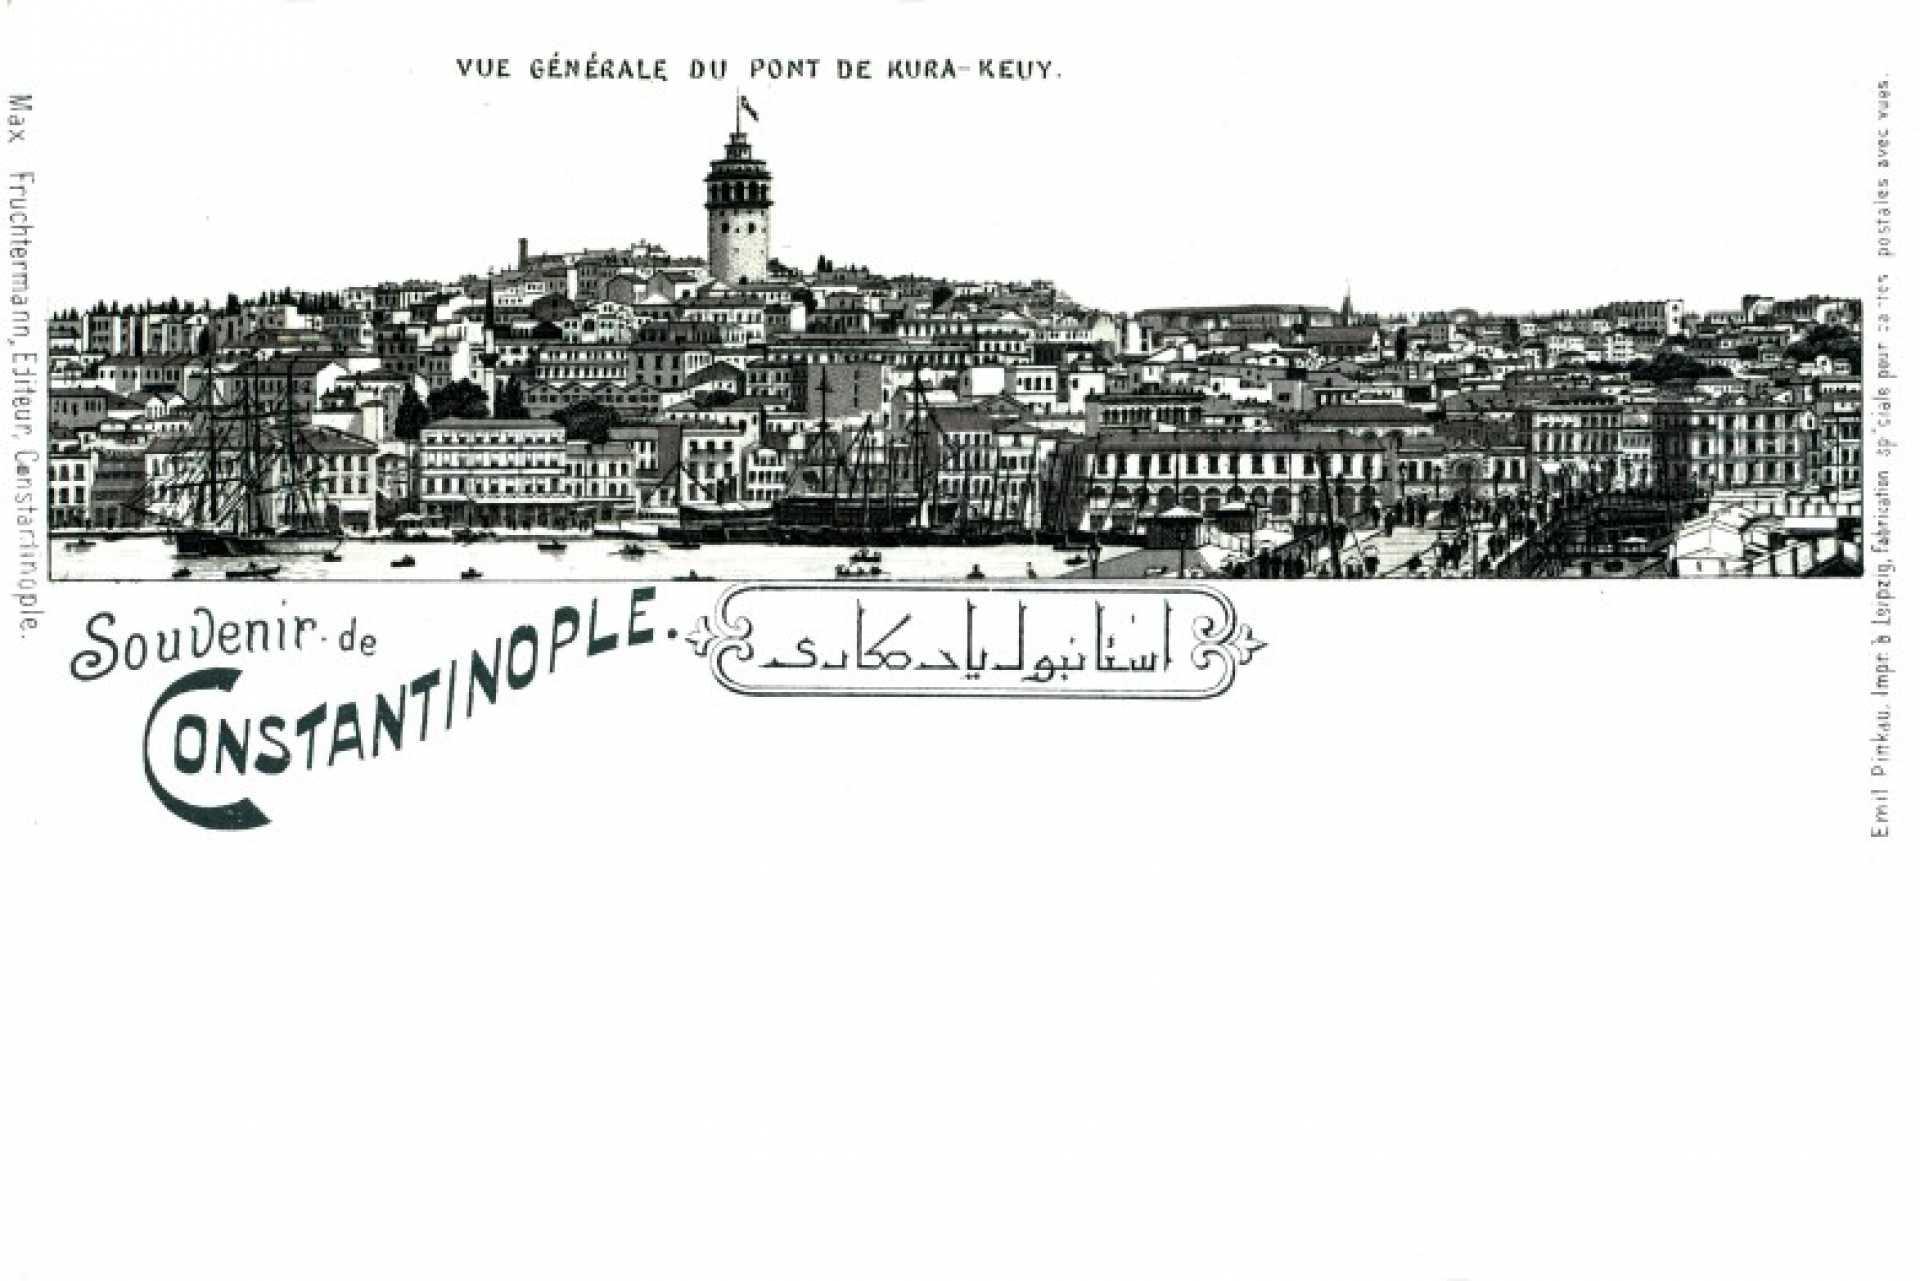 Souvenir de Constantinople. Vue Generale du point de Kura-keuy